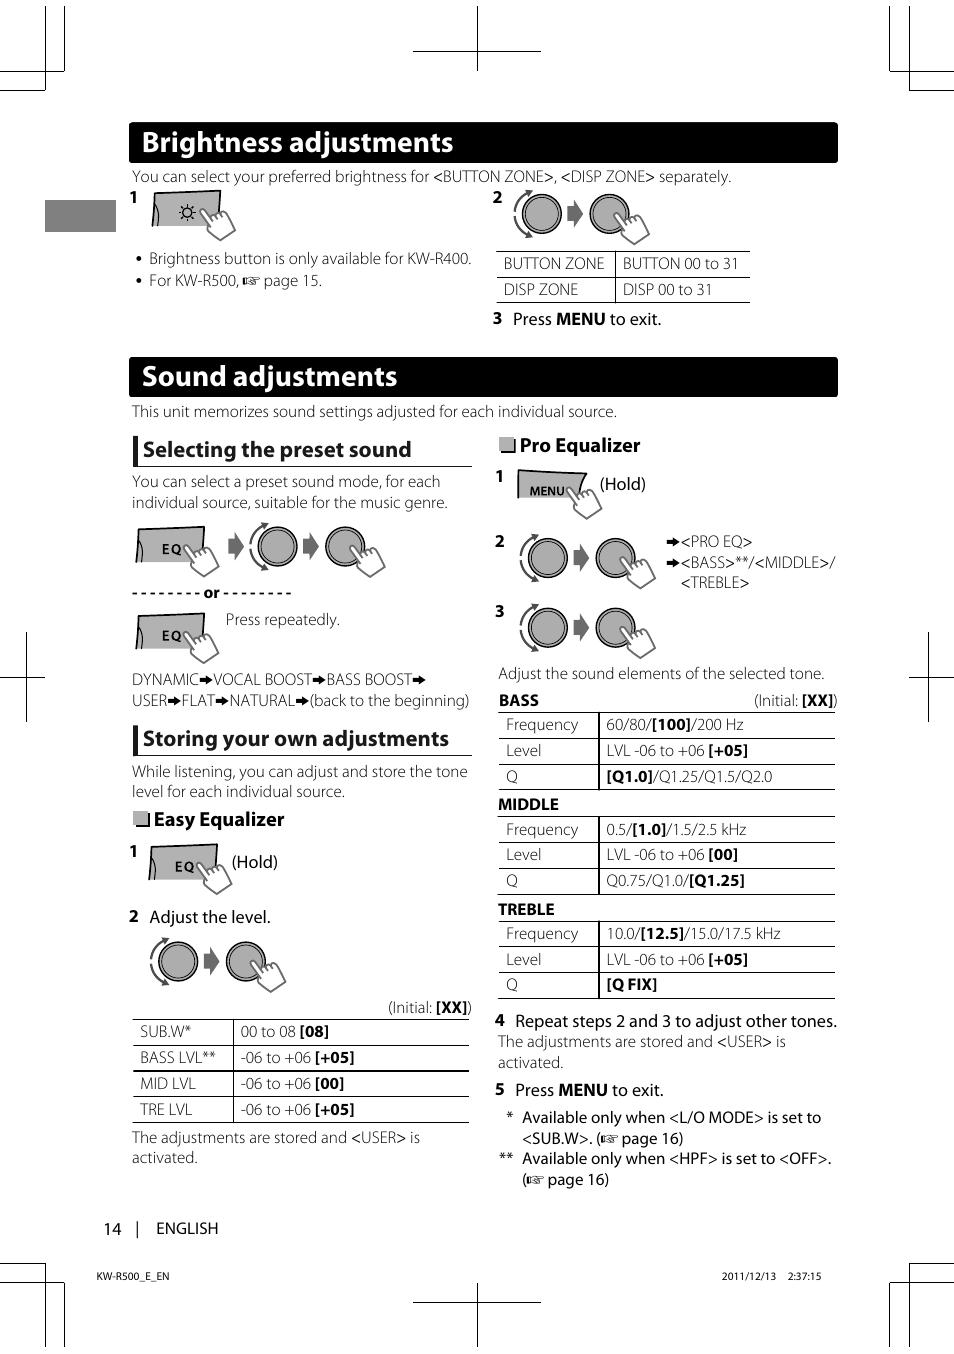 Sound adjustments, Brightness adjustments, Selecting the preset